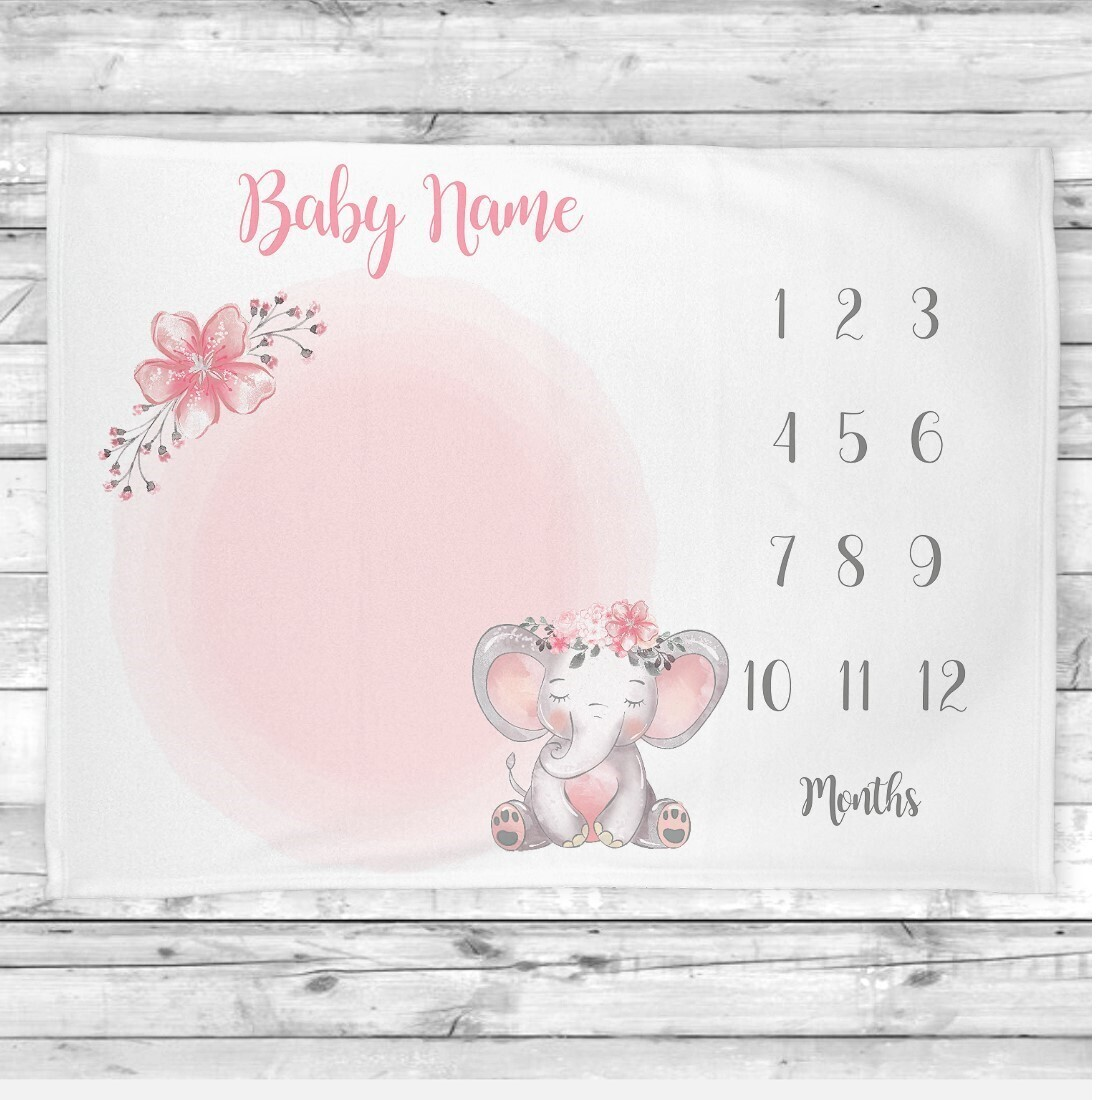 Pink Flowers Elephant Baby Girl Milestone Blanket Baby Nursery Decor Month New Baby Shower Gift Baby Photo Op Backdrop